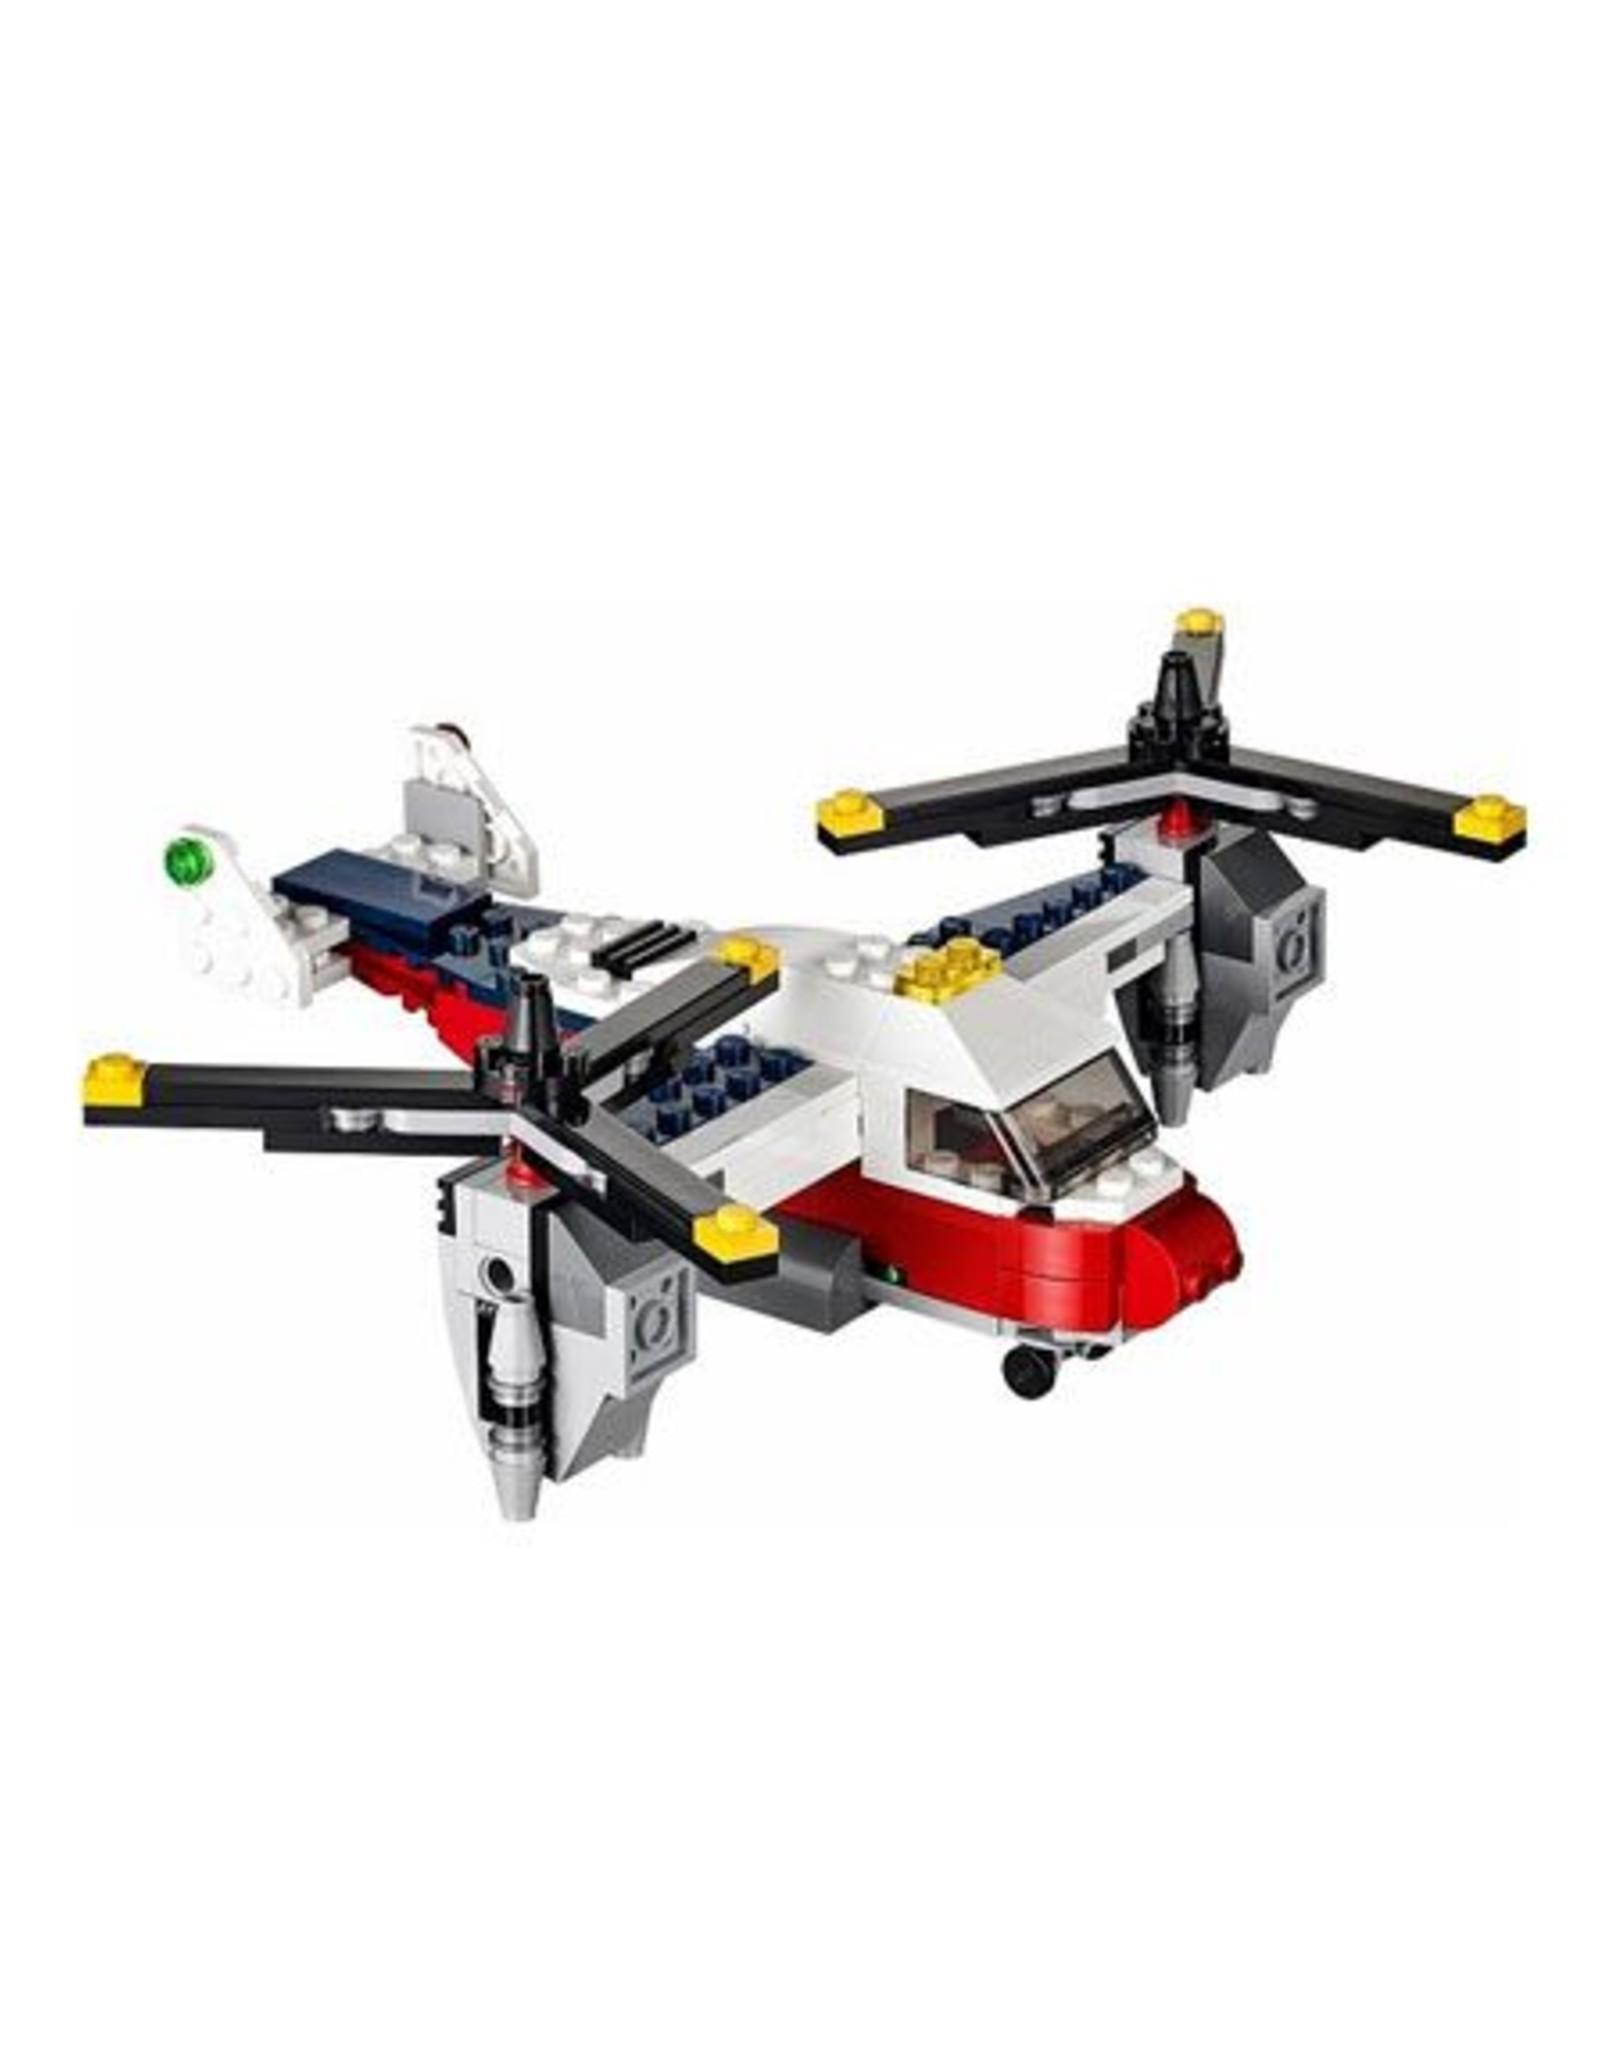 LEGO LEGO 31020 Twinblade Adventures CREATOR